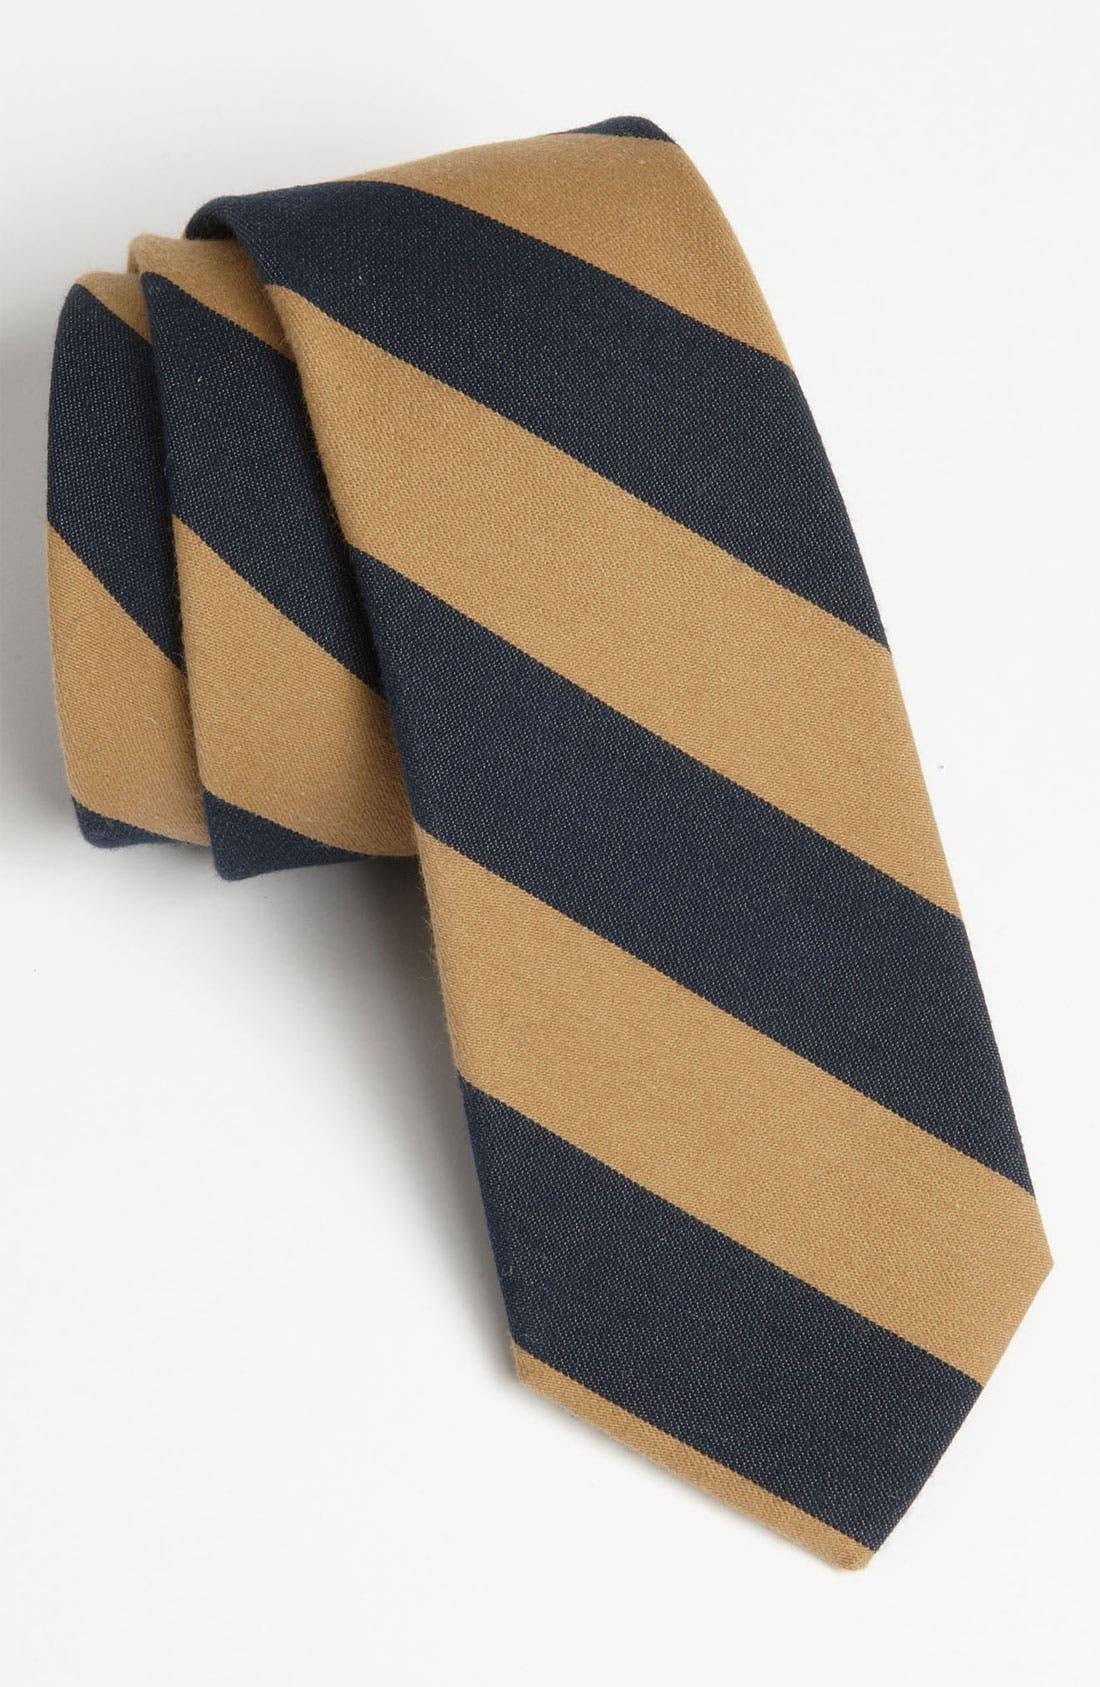 Alternate Image 1 Selected - Gitman Woven Tie (Online Only)